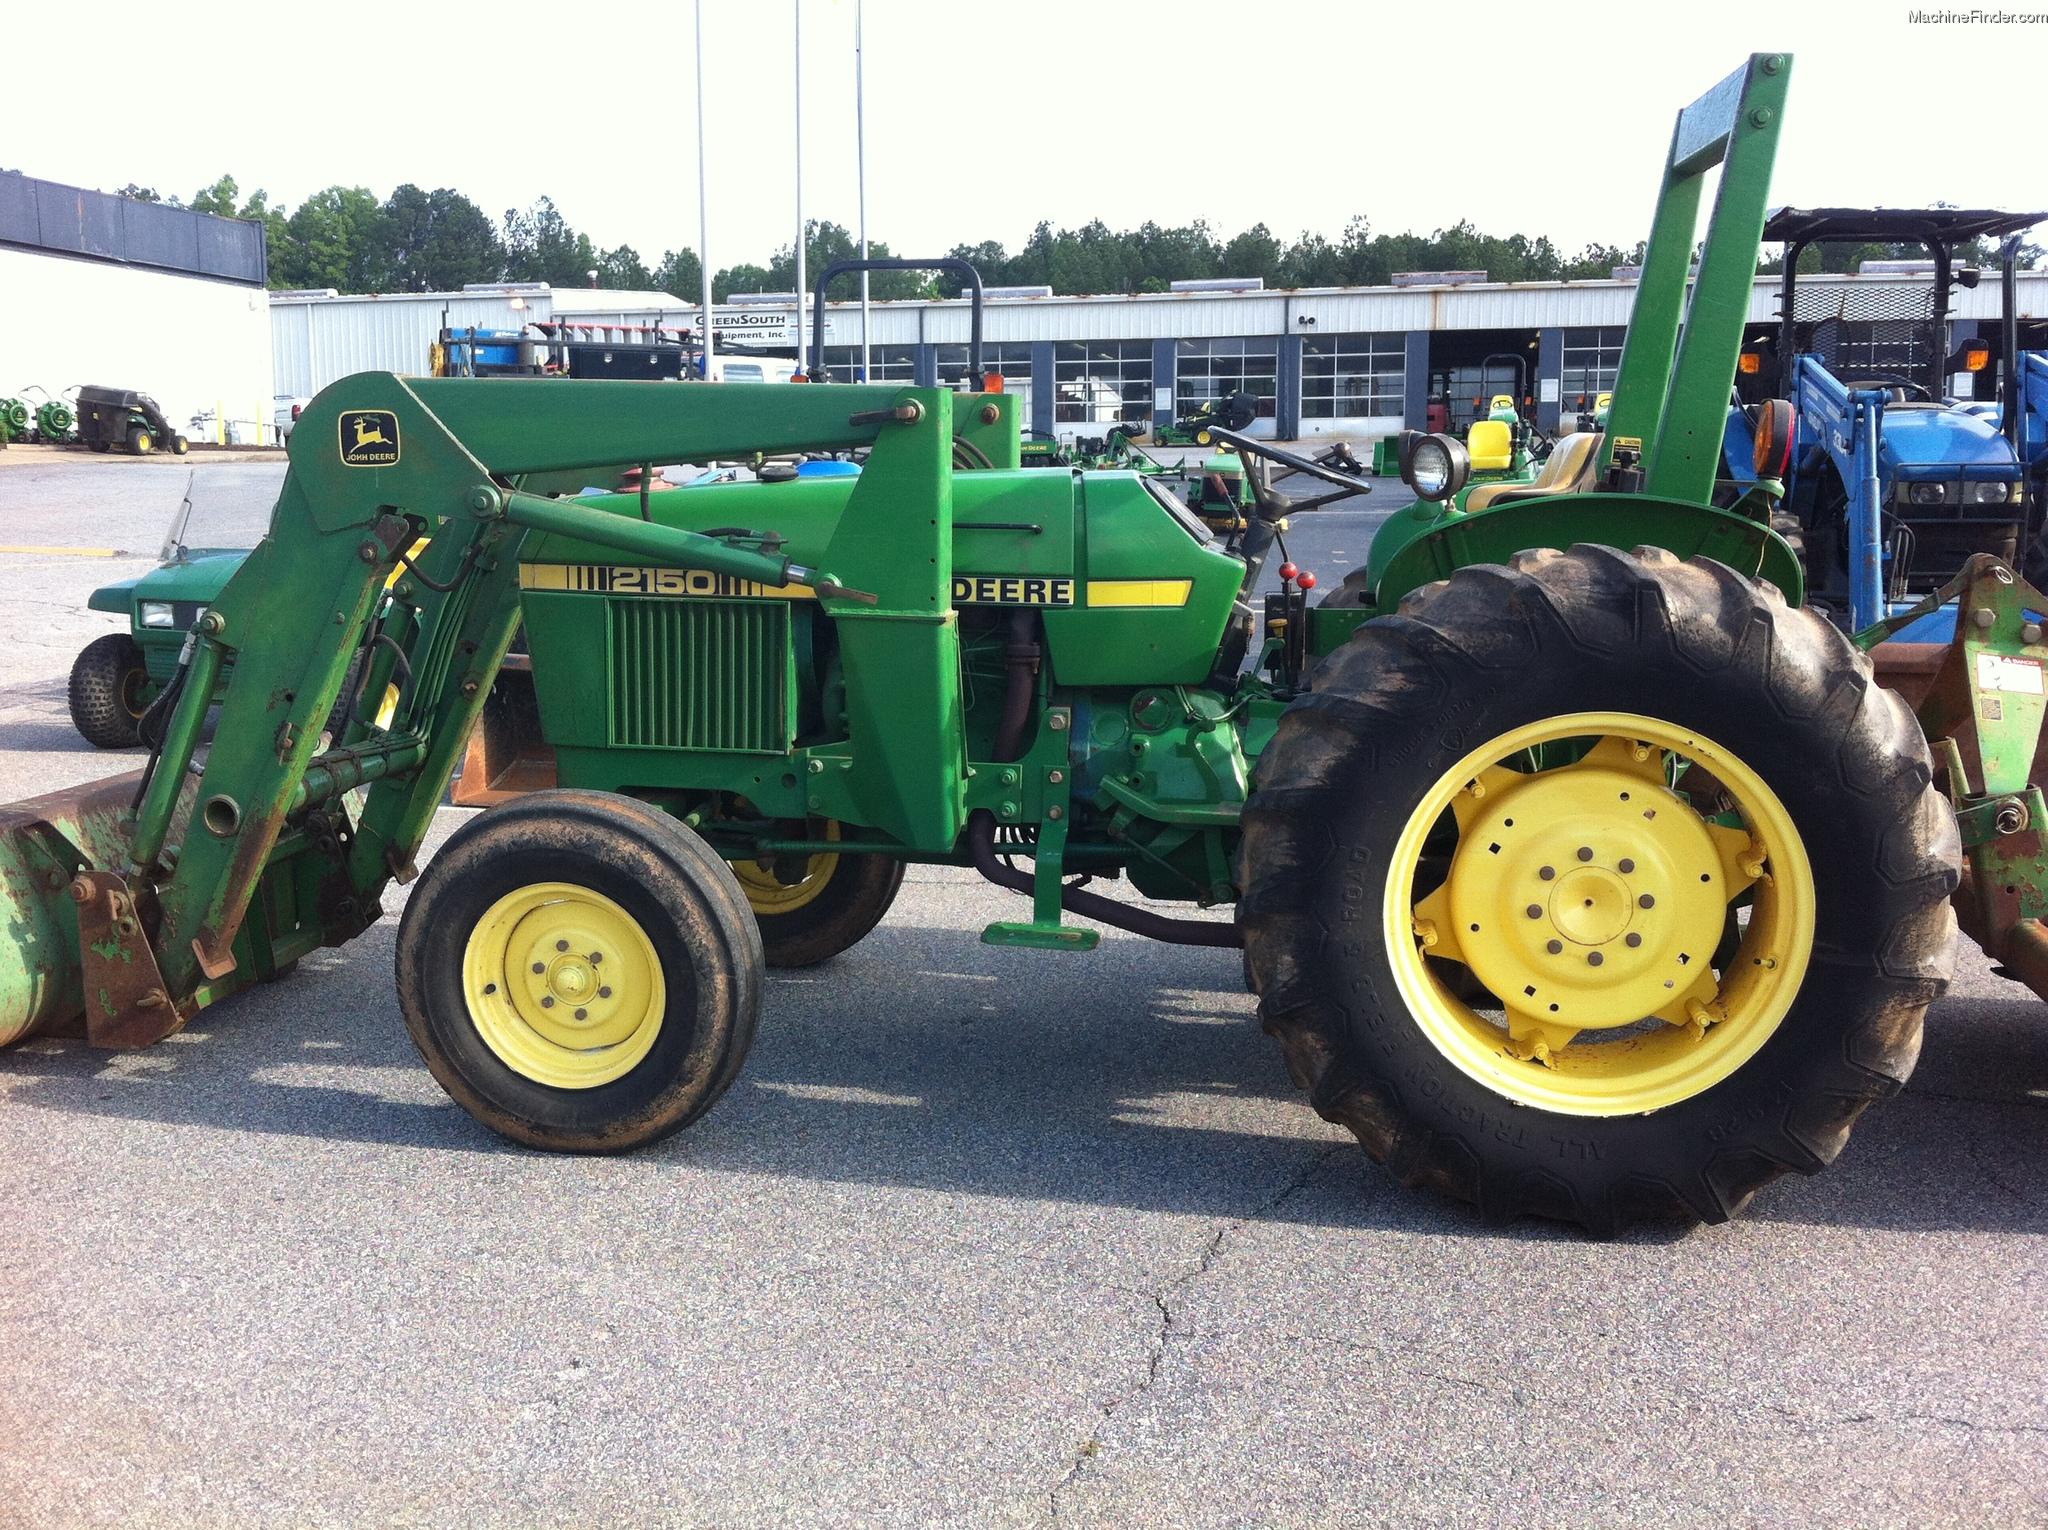 1986 John Deere 2150 Tractors - Compact (1-40hp.) - John ...